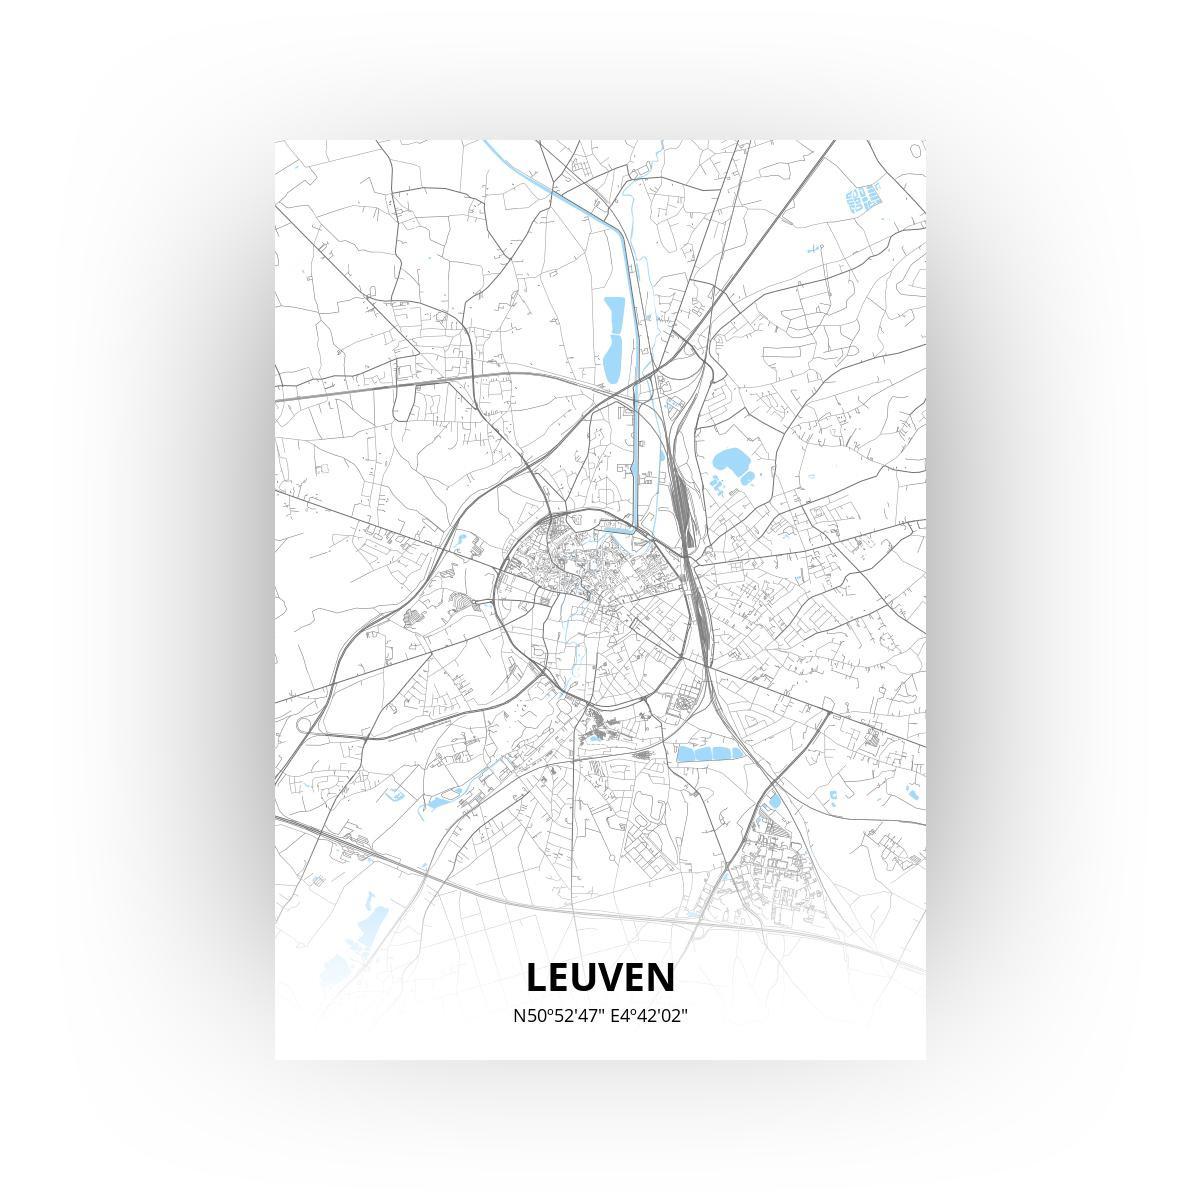 Leuven print - Standaard stijl